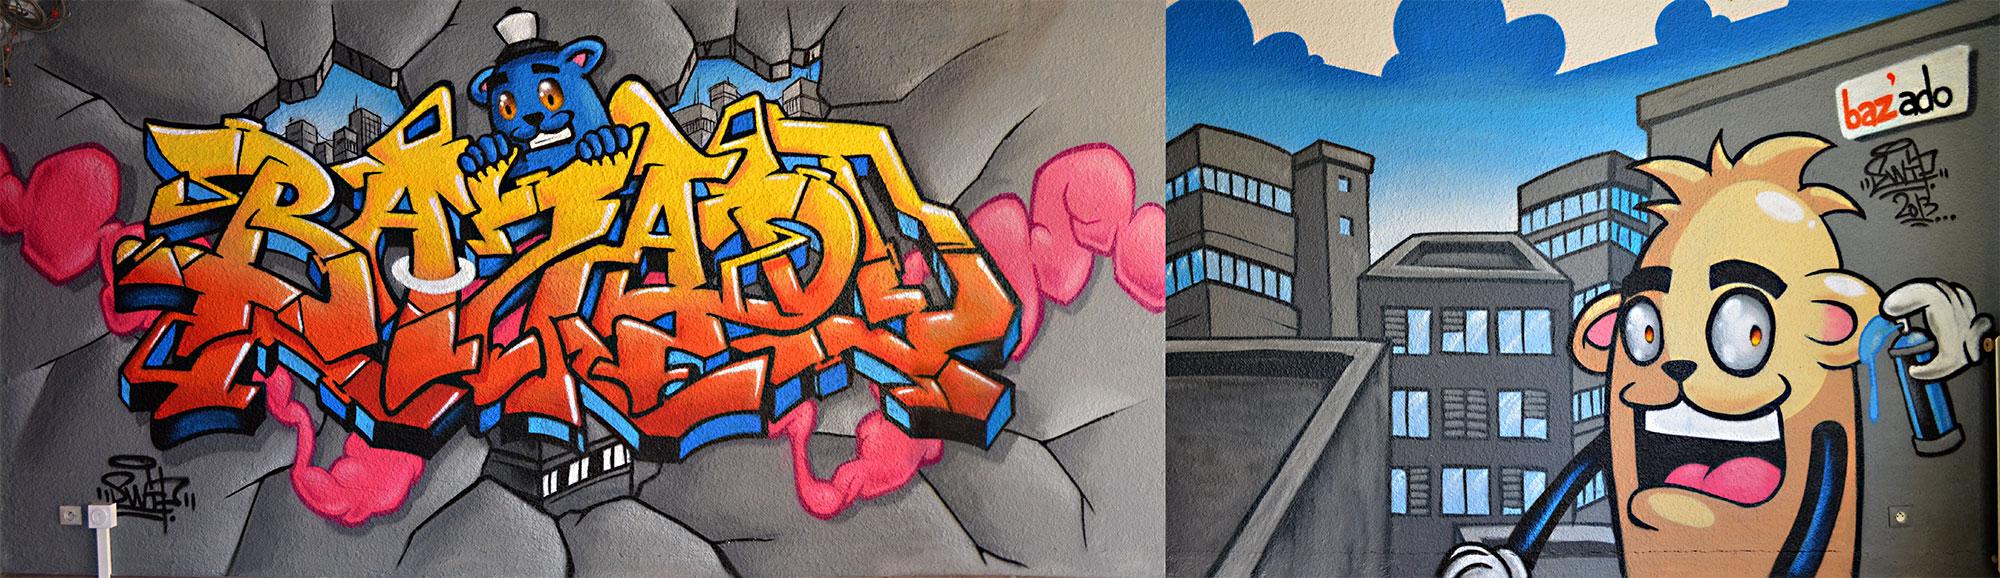 Decoration salle jeune de Baziege graffiti graff toulouse swi swiponer wxp 31